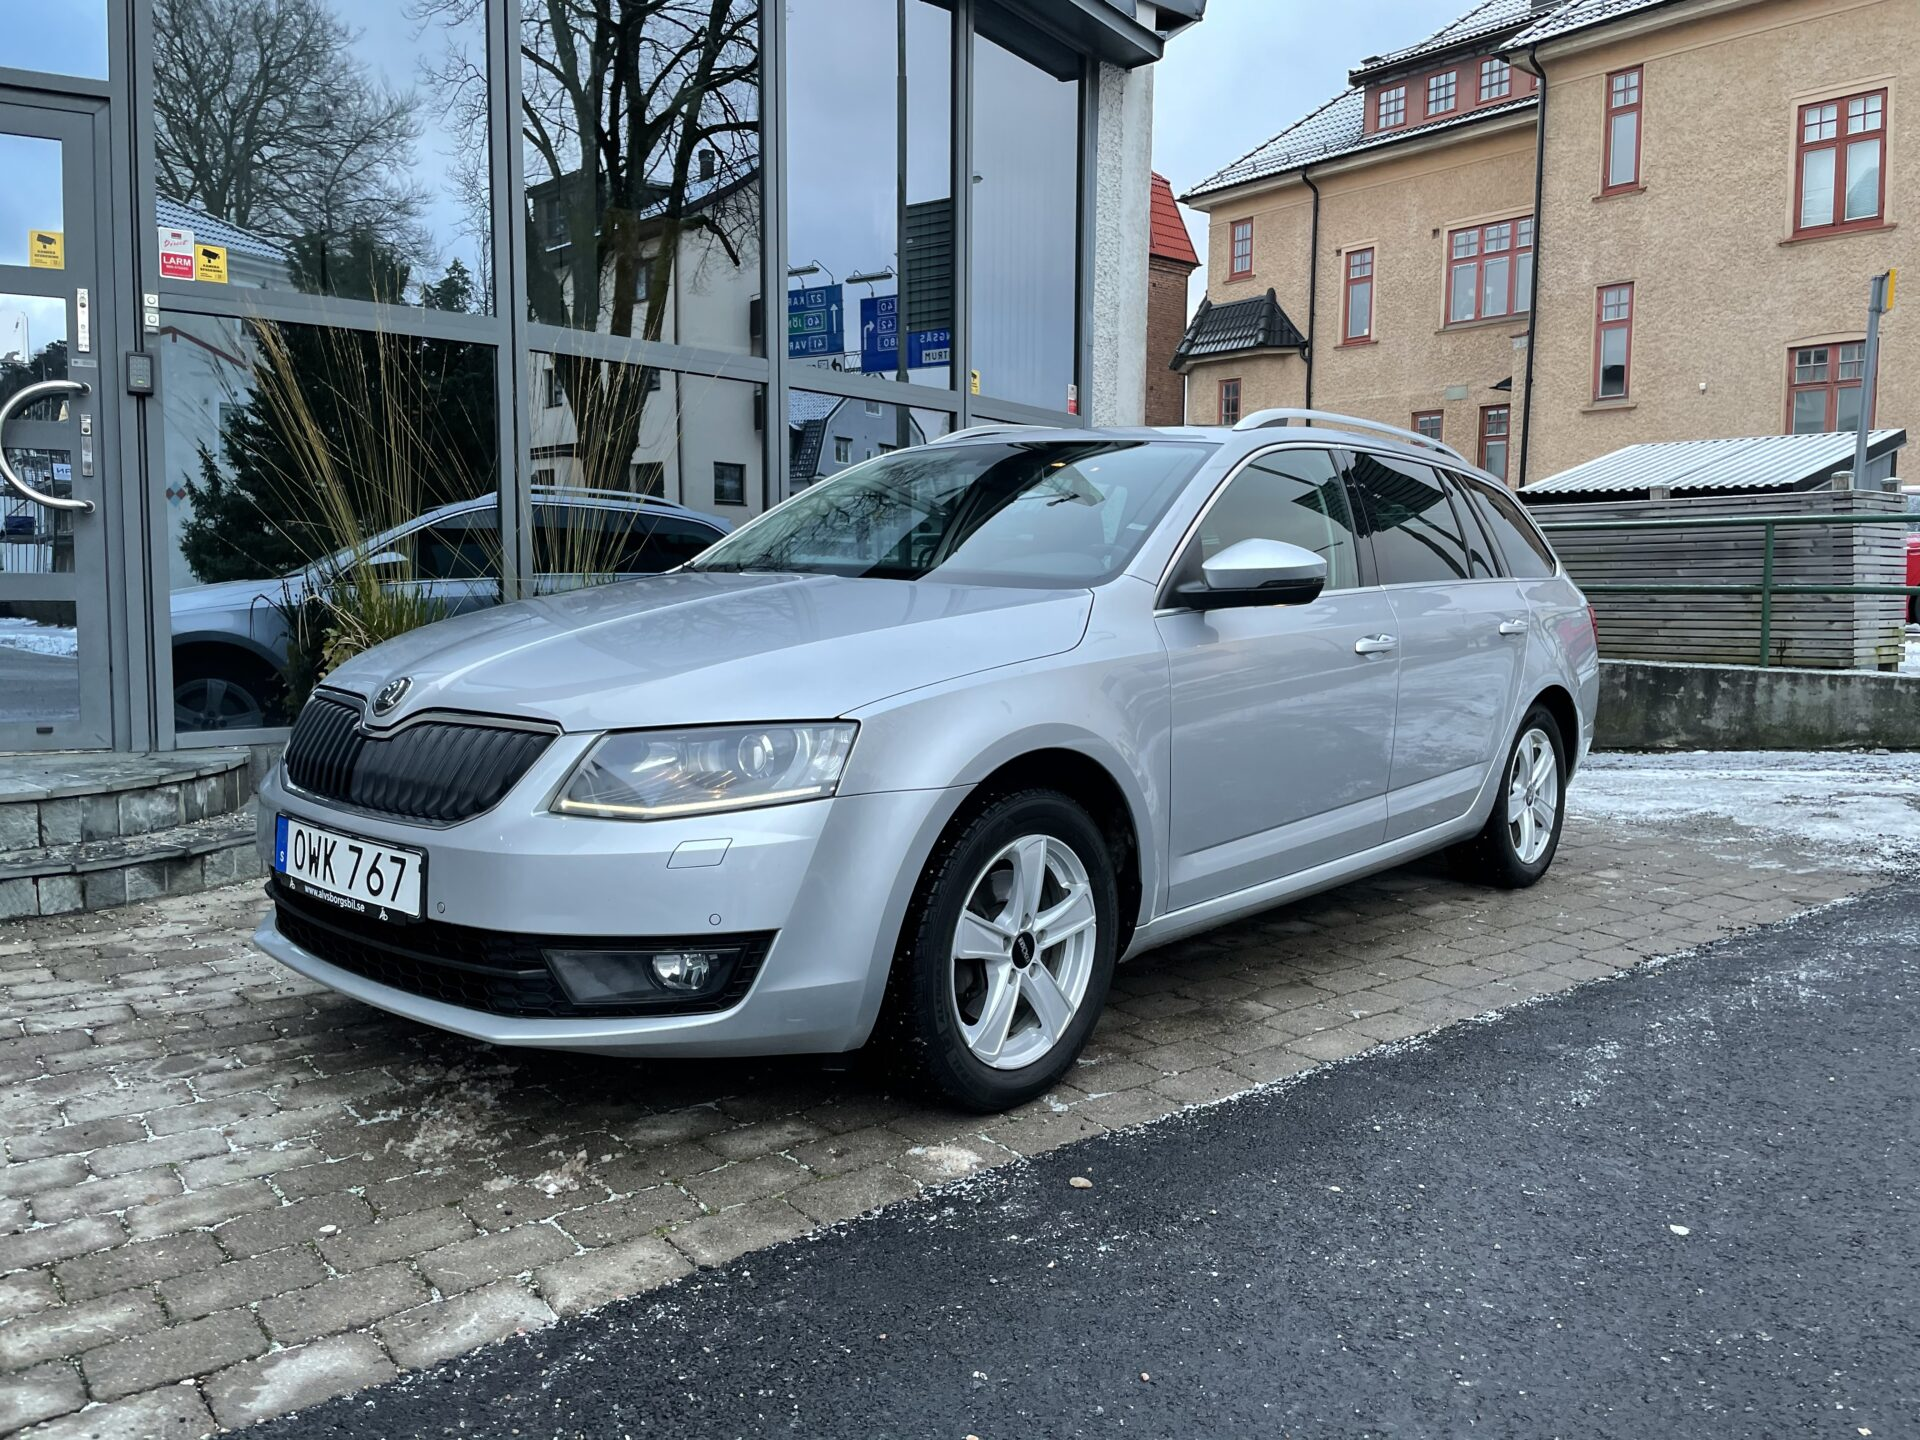 Skoda Octavia Kombi 1.4 CNG 110hk Elegance / Panorama/V-hjul